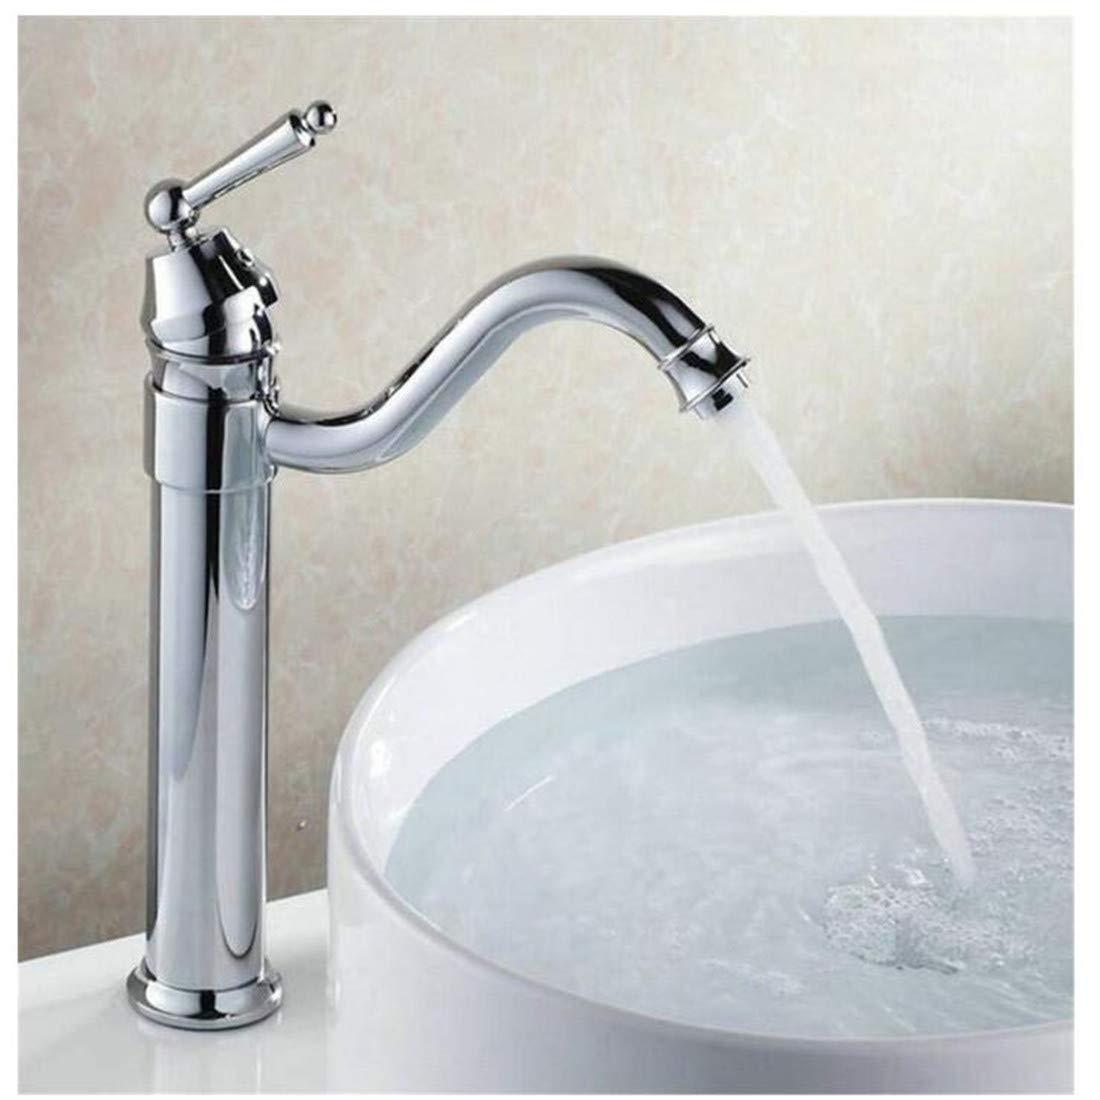 Kitchen Bath Basin Sink Bathroom Taps Faucet Washbasin Mixer Swivel Bathroom Basin Sink Brass Faucet Ctzl1144